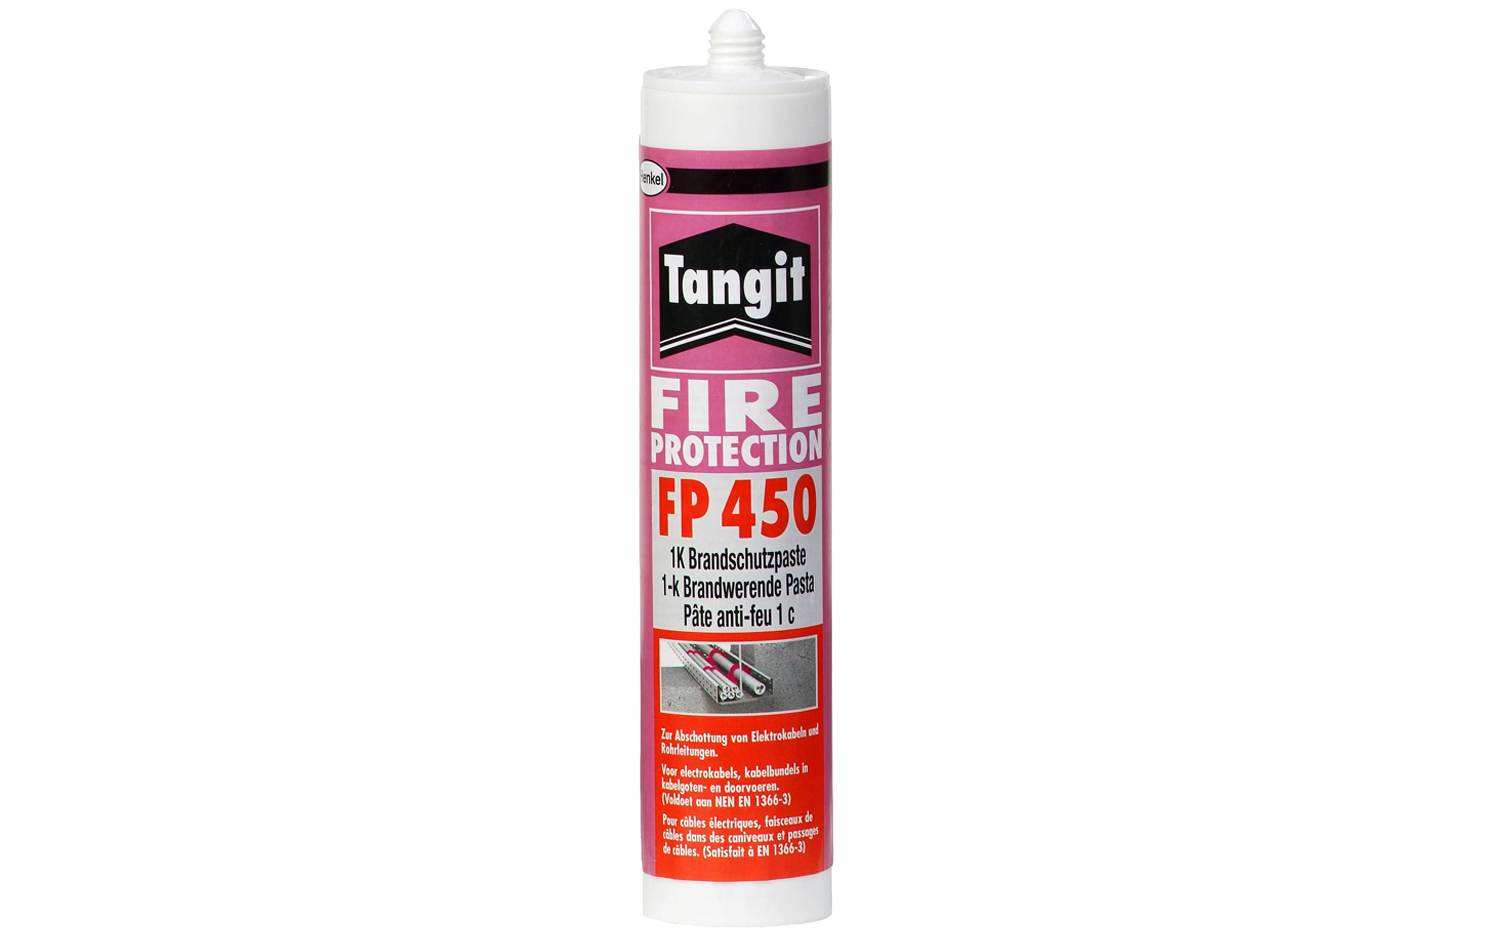 Tangit_FP_450_2181450.jpg